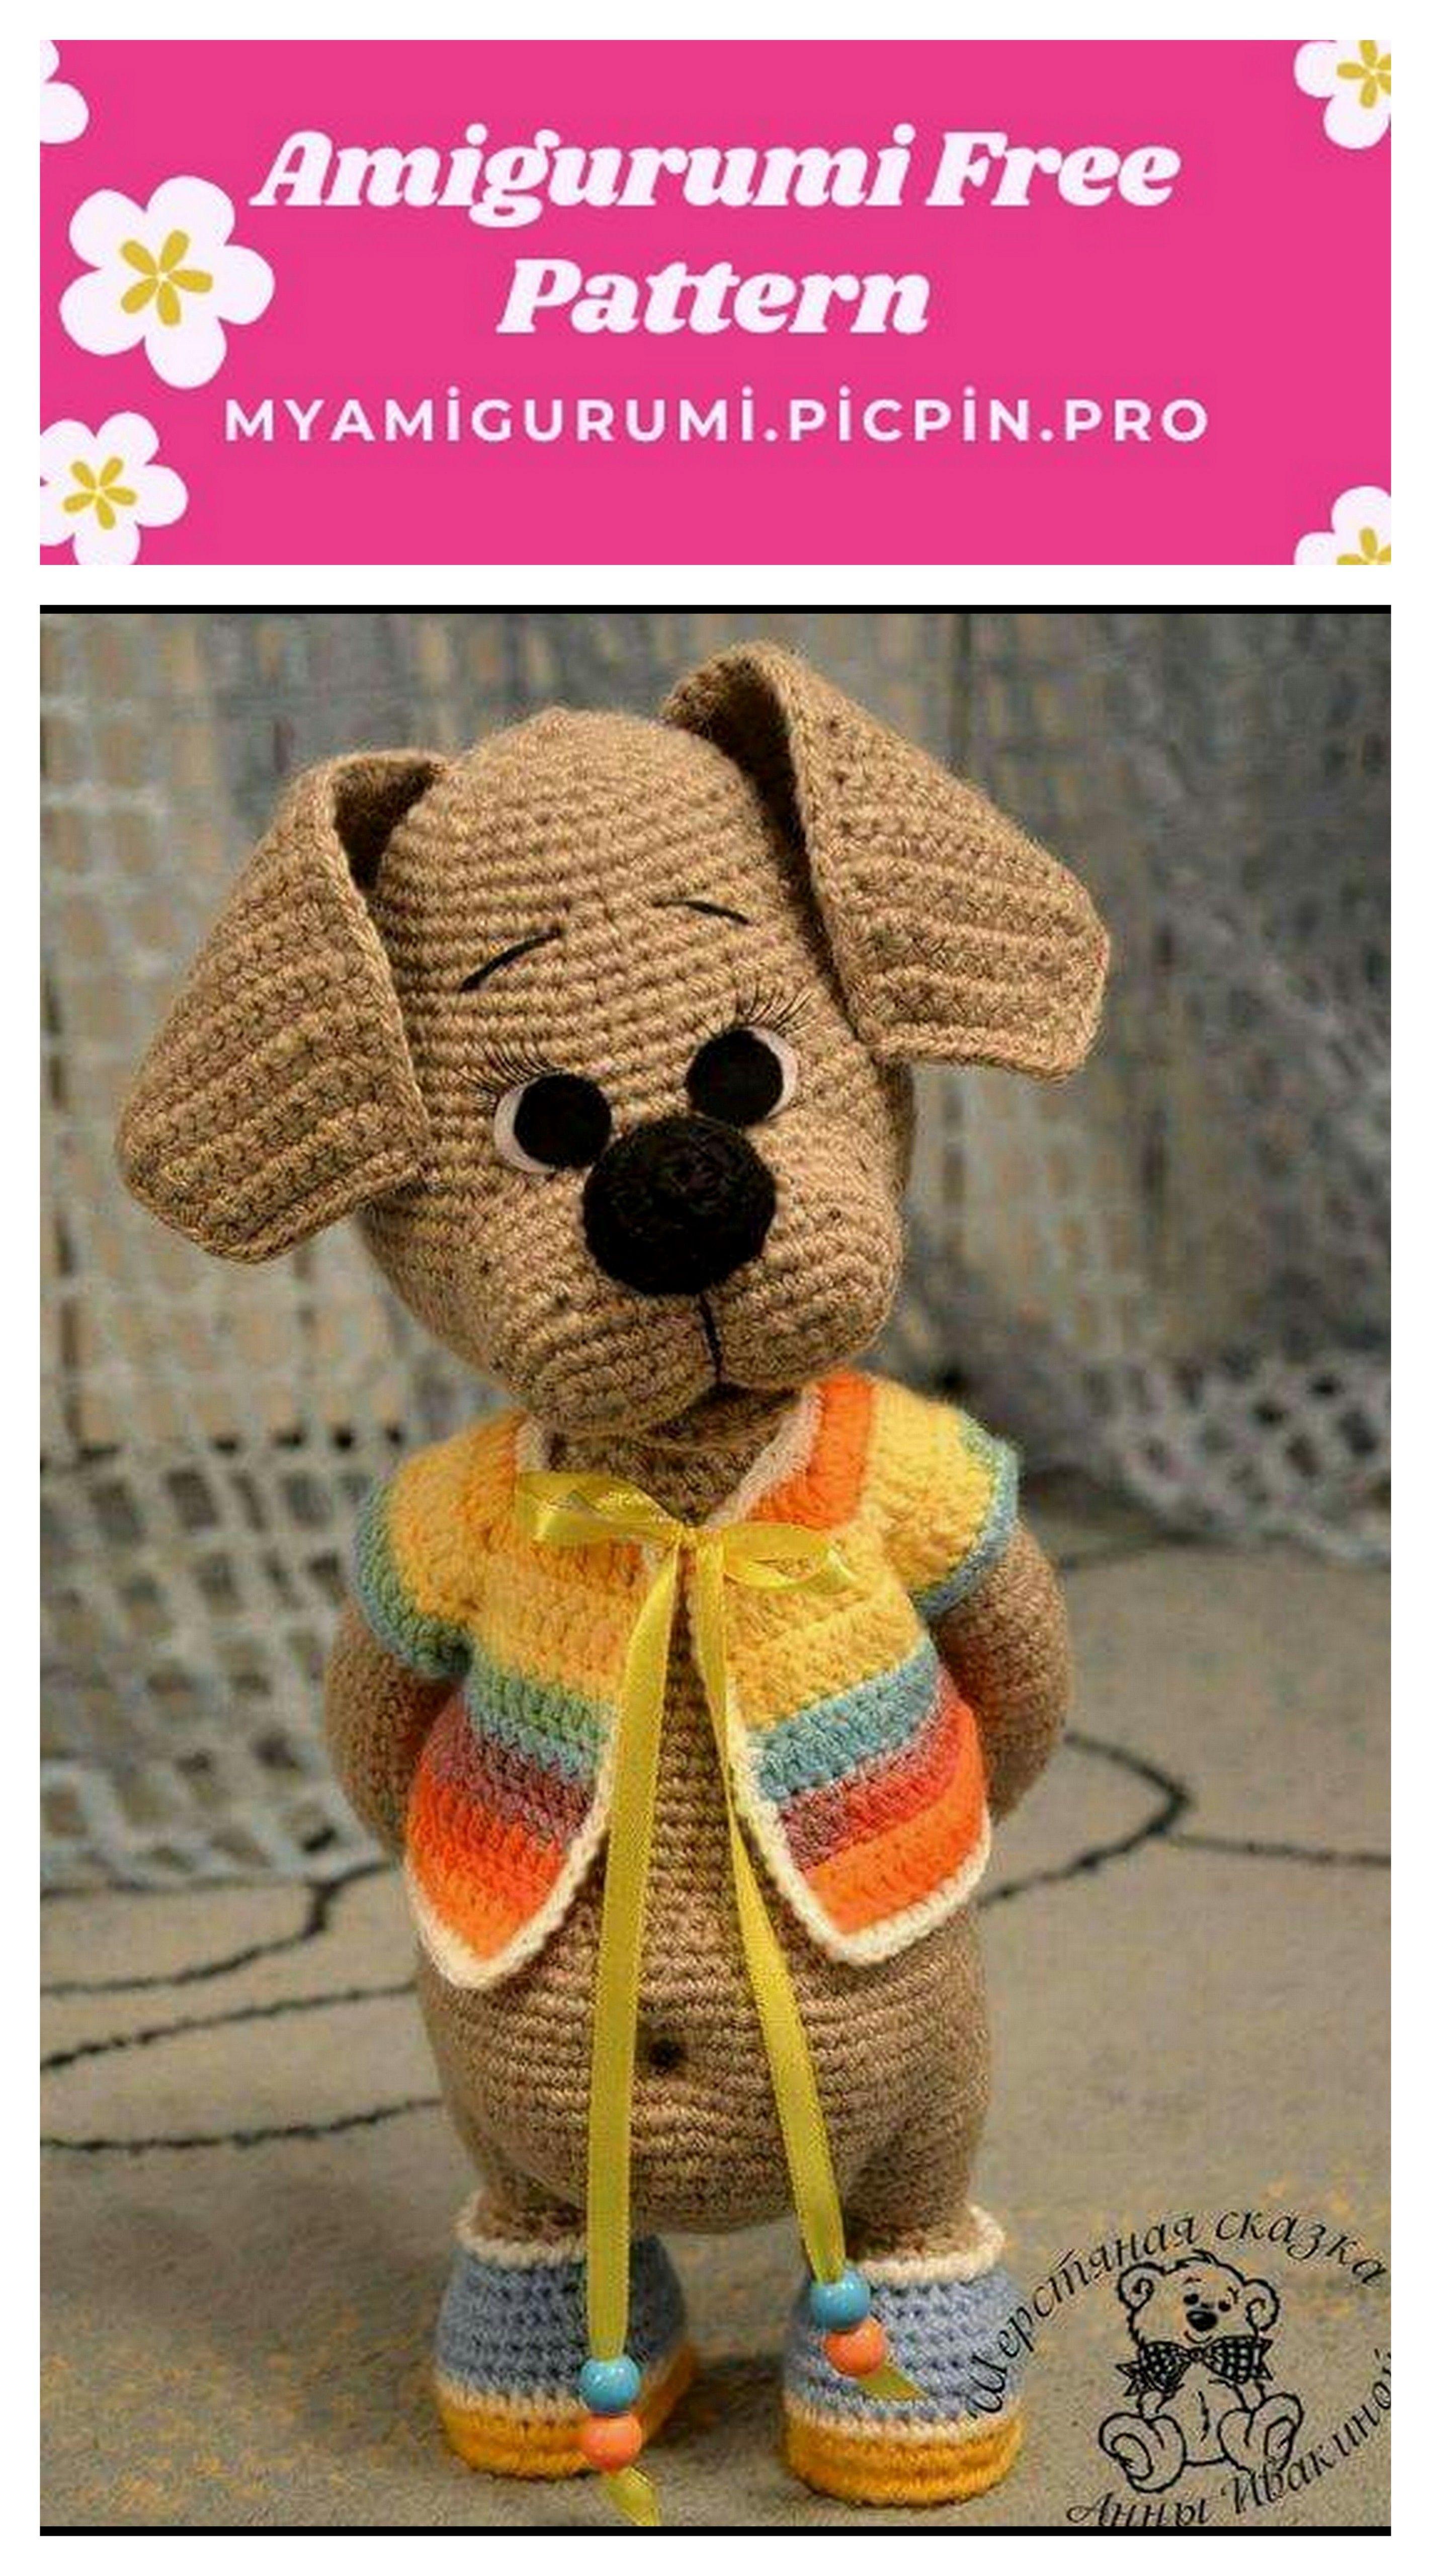 Grandmother's Pattern Book Crochet Amigurumi Dogs – free patterns ... | 5120x2845